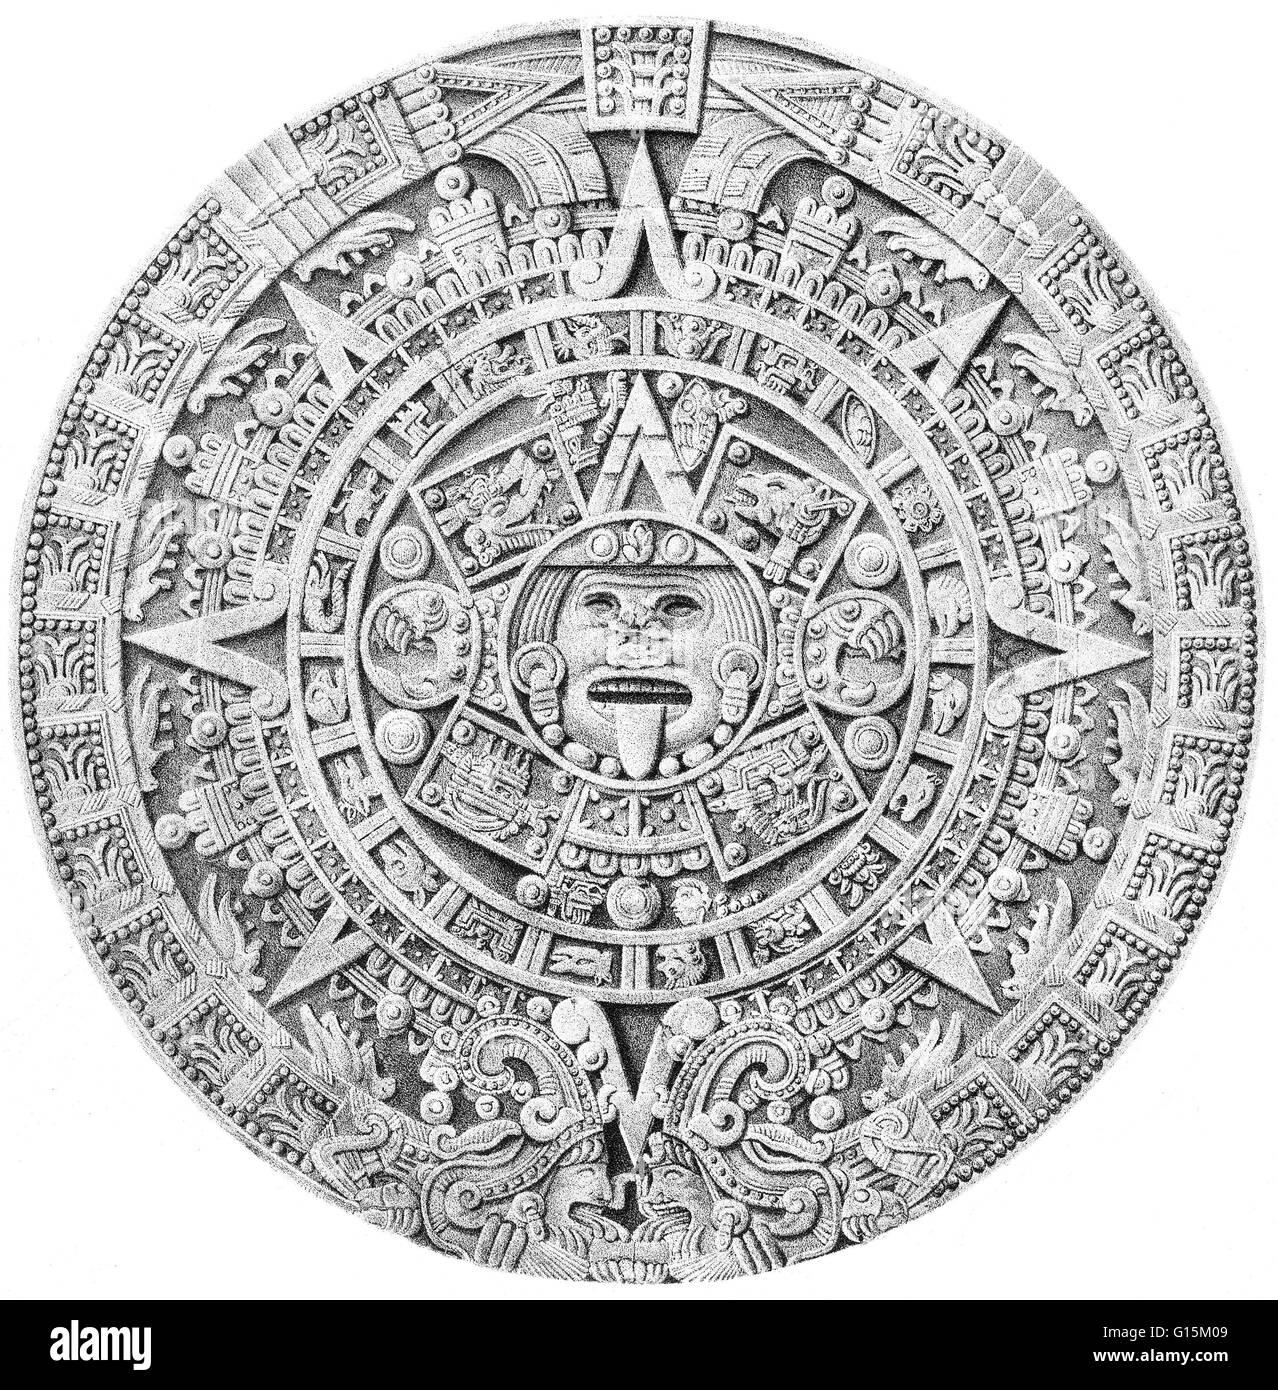 Aztec Calendar Illustration : Illustration of the aztec calendar most precious